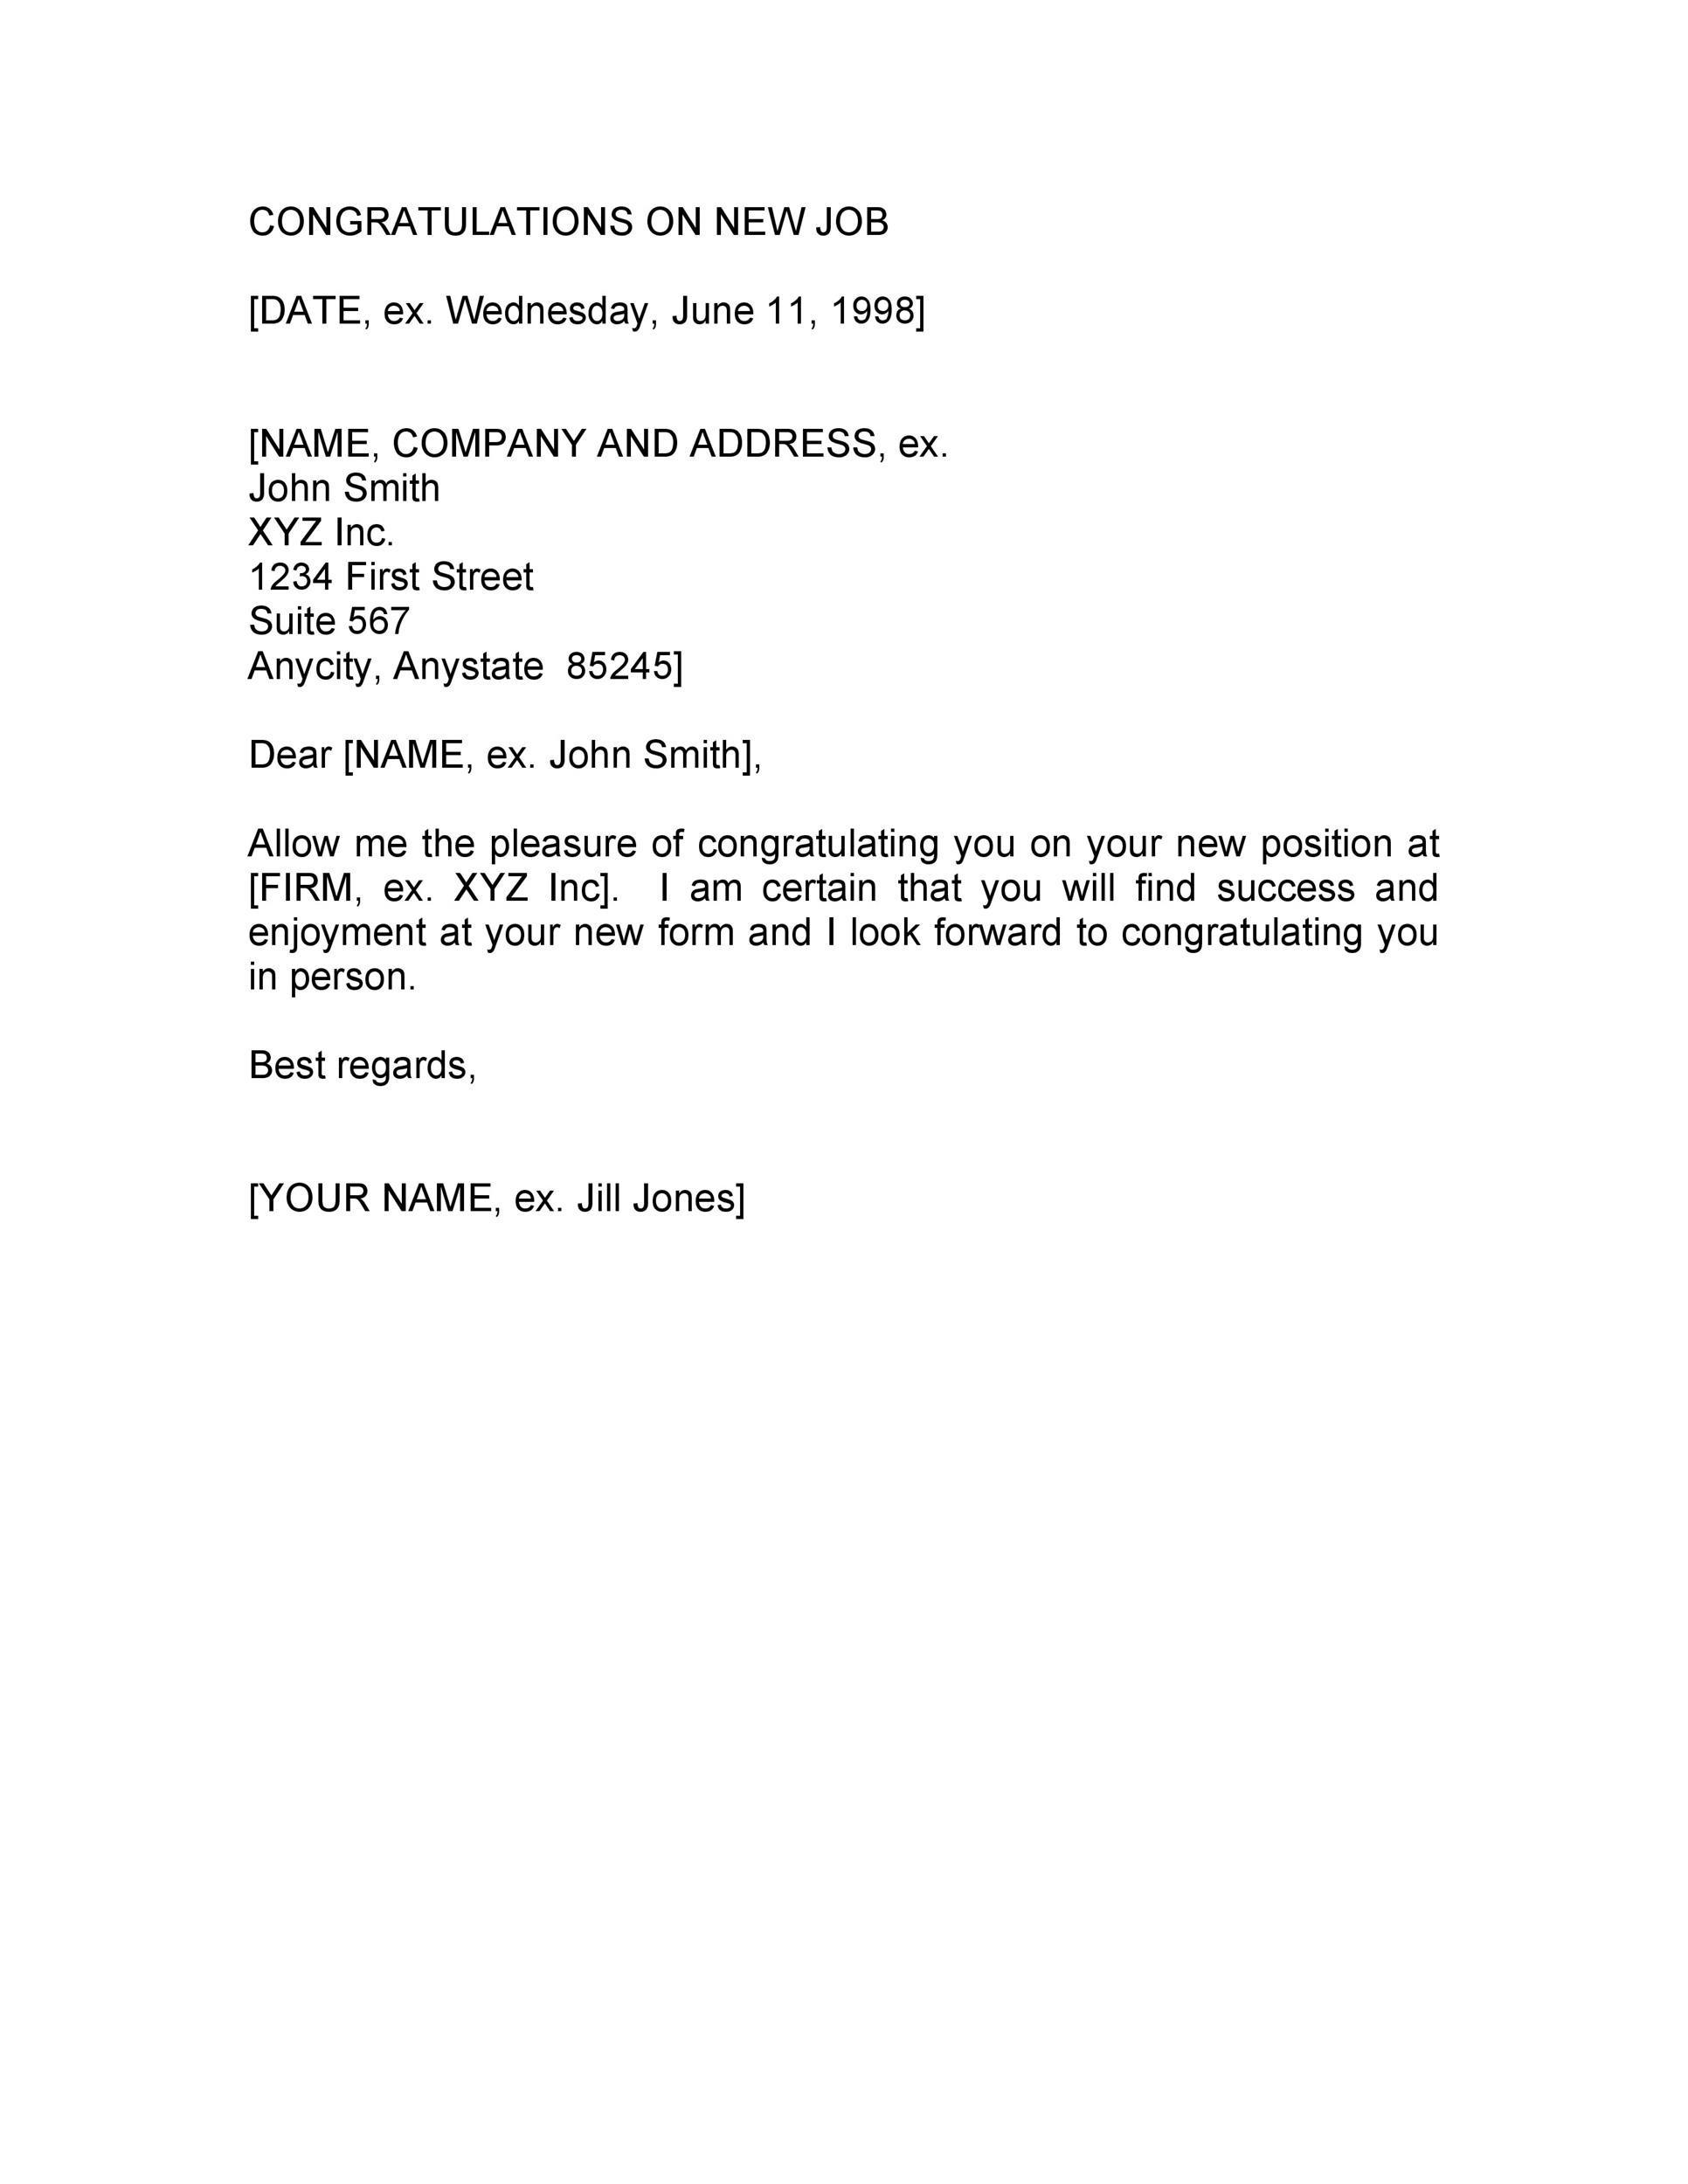 Congratulations Letter New Job from templatelab.com